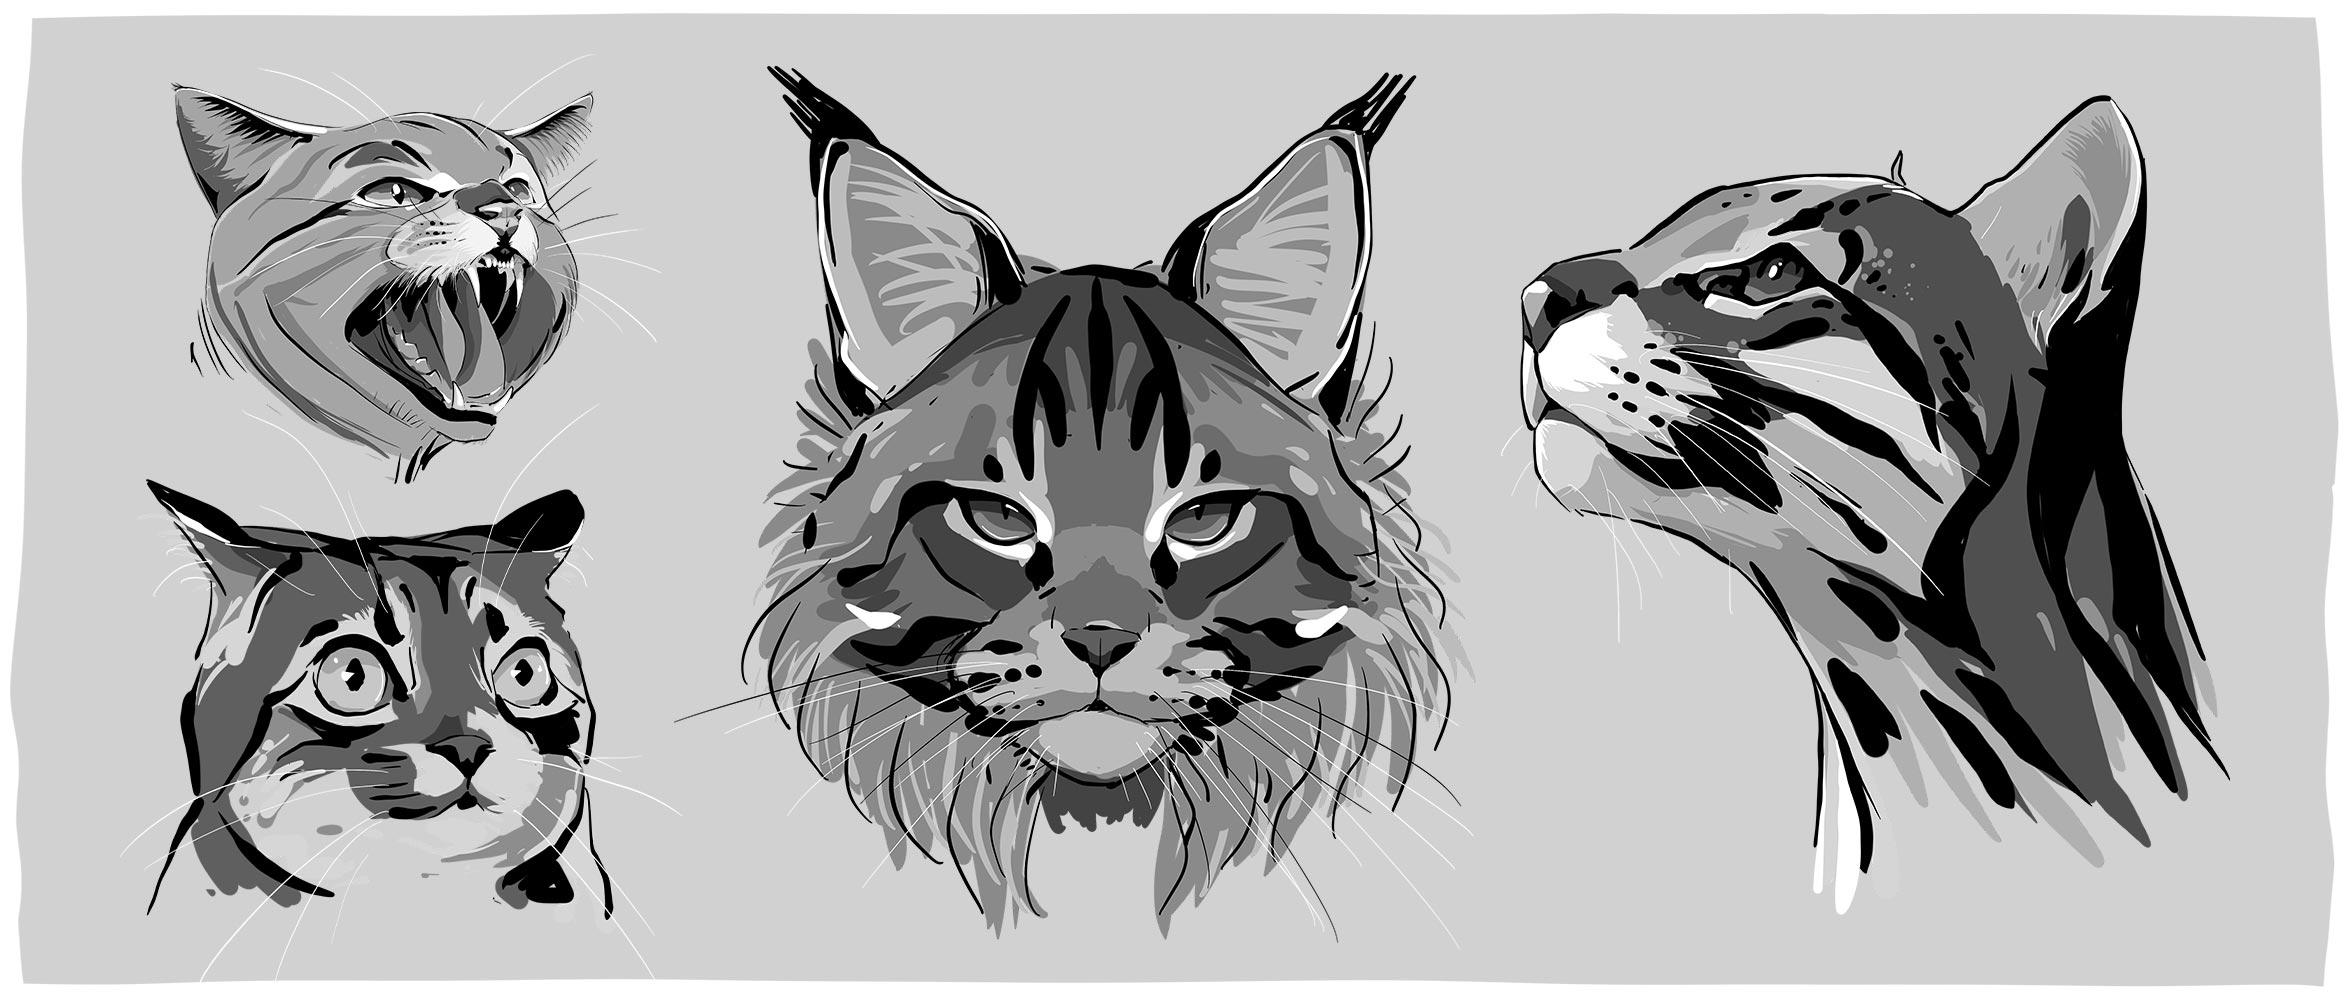 Andreas-Geier-Inks-Cats